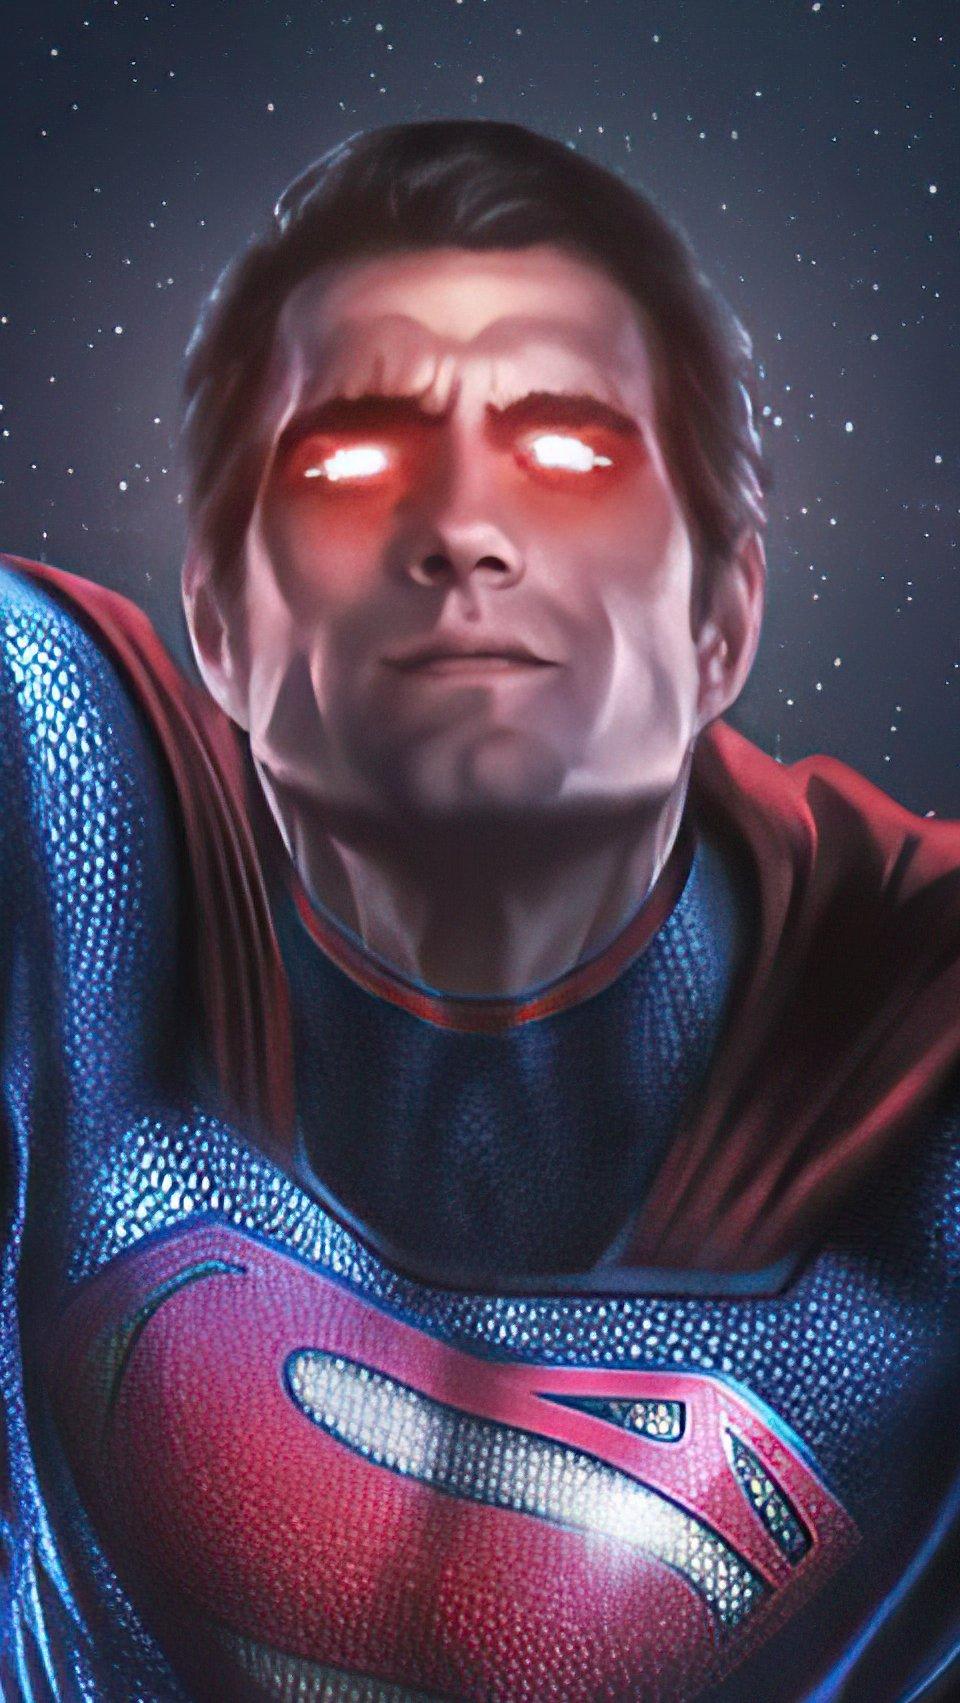 Wallpaper Henry Cavill as Superman 2020 Vertical